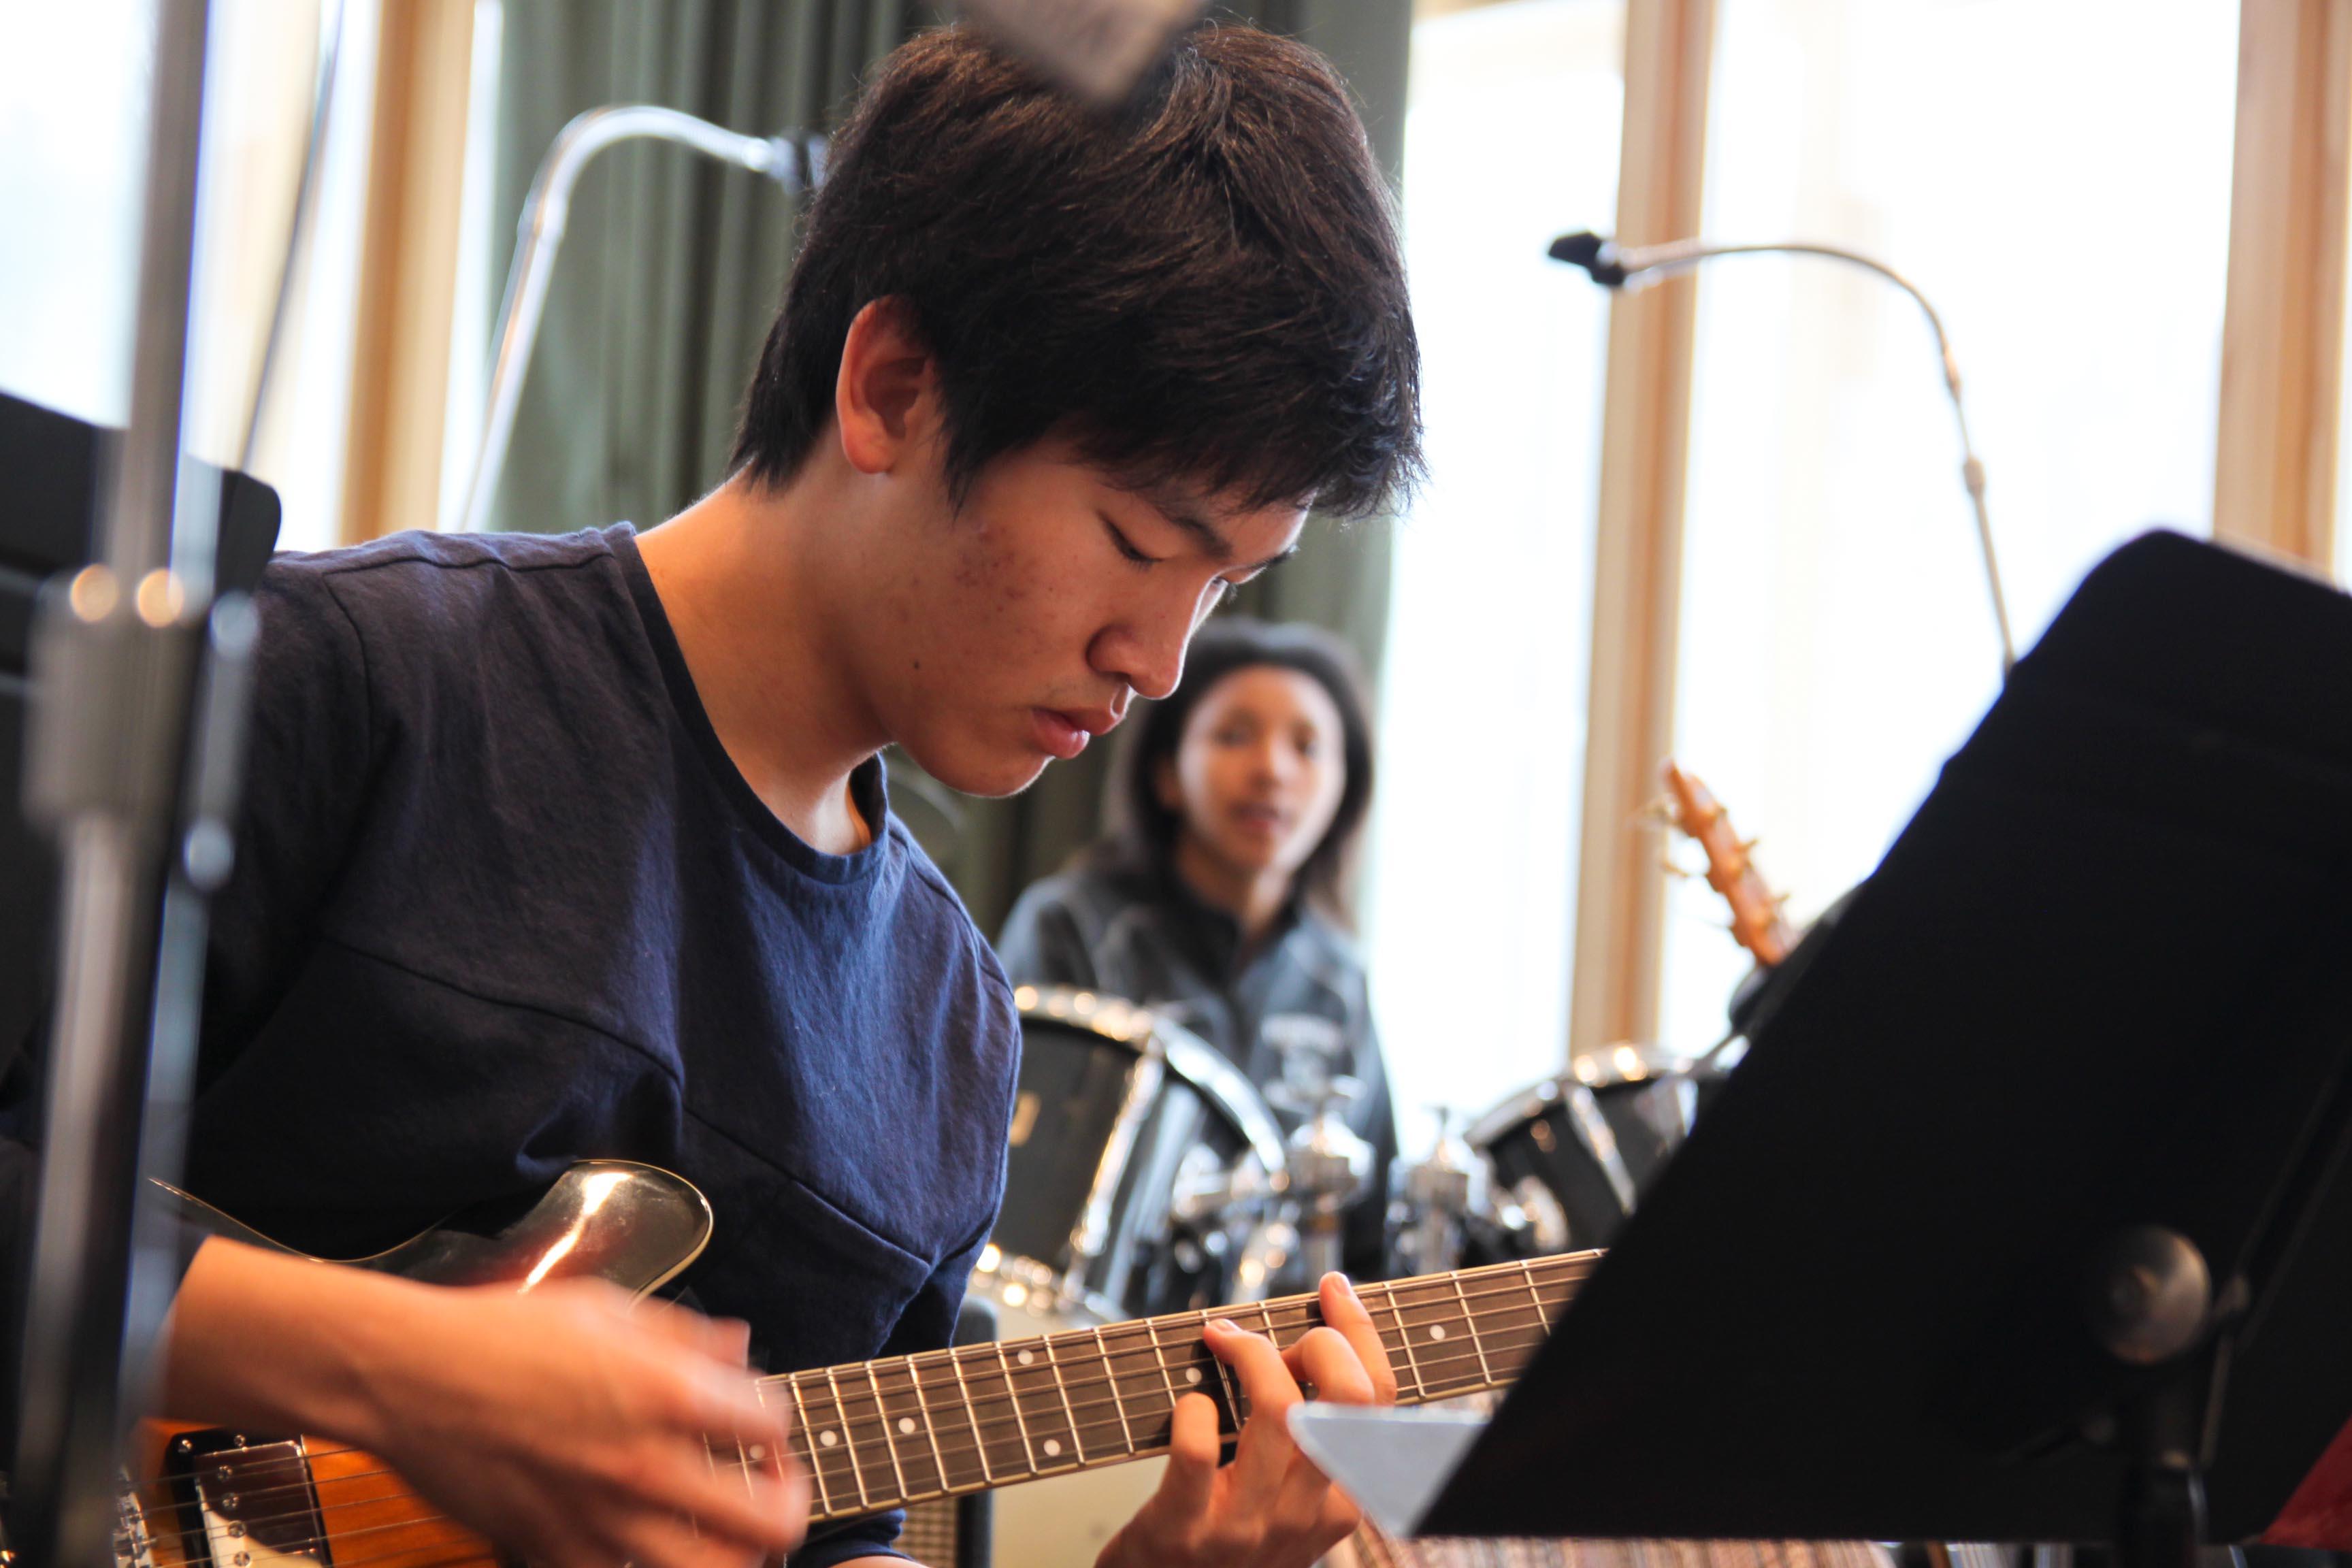 Proctor Academy music